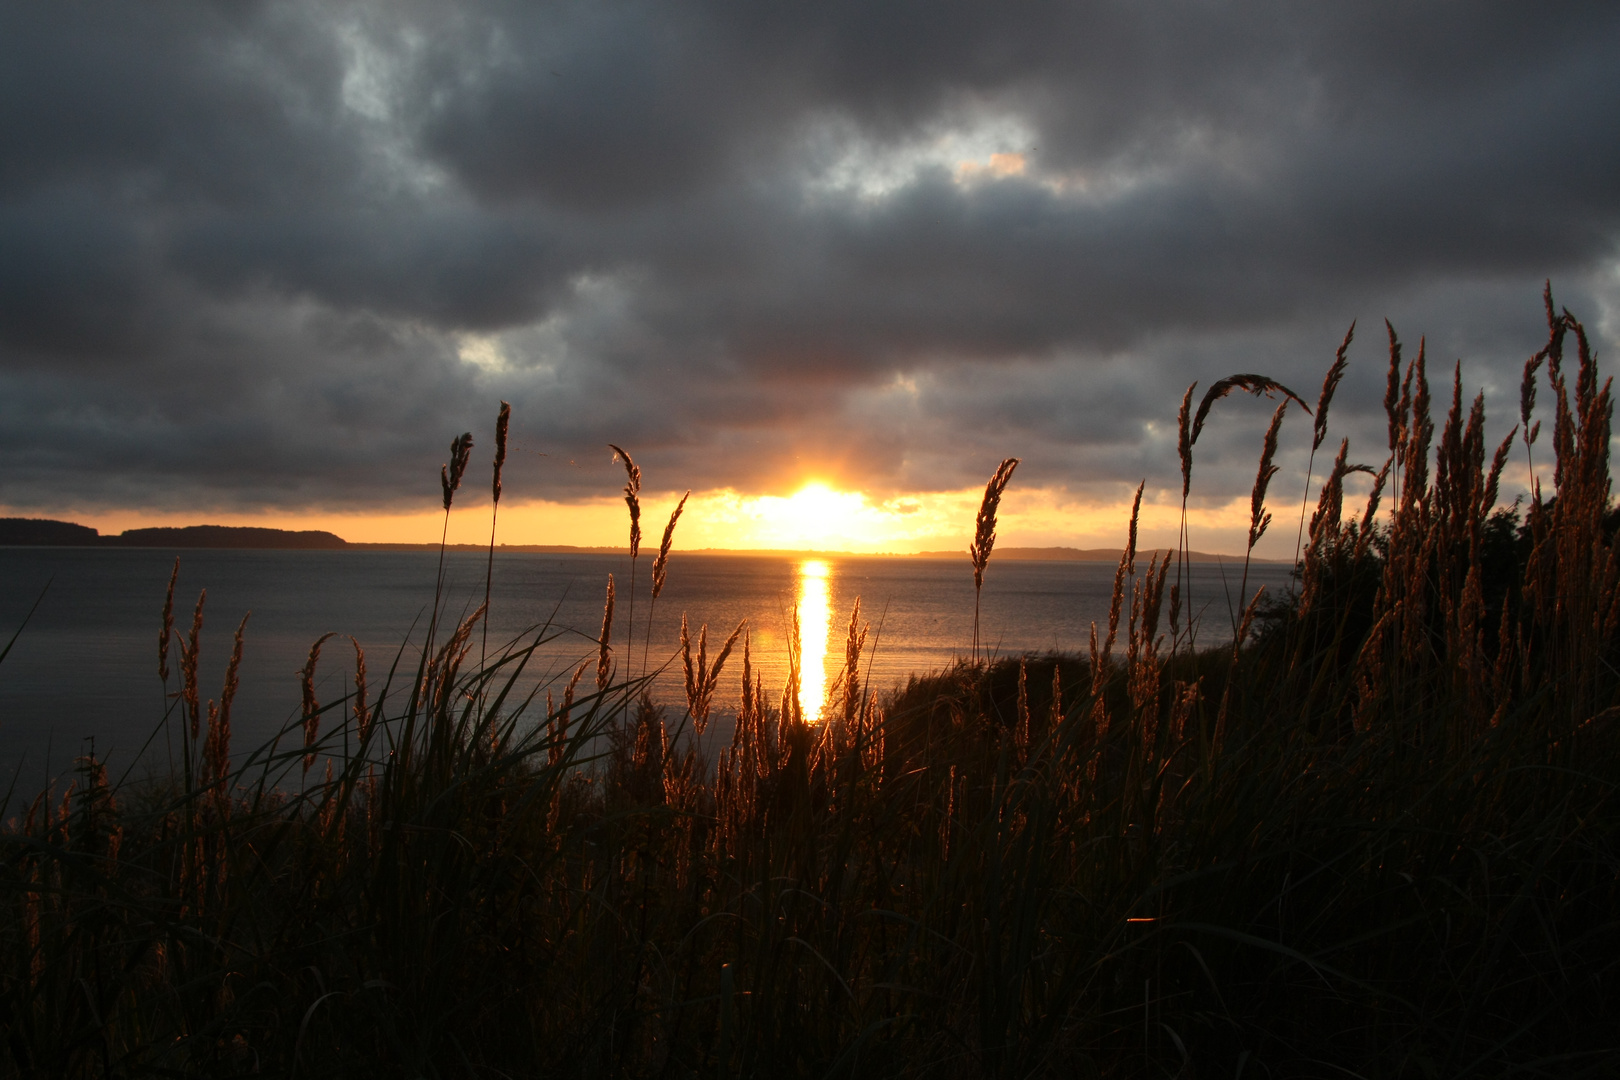 Sonnenuntergang bei Lietzow auf Rügen